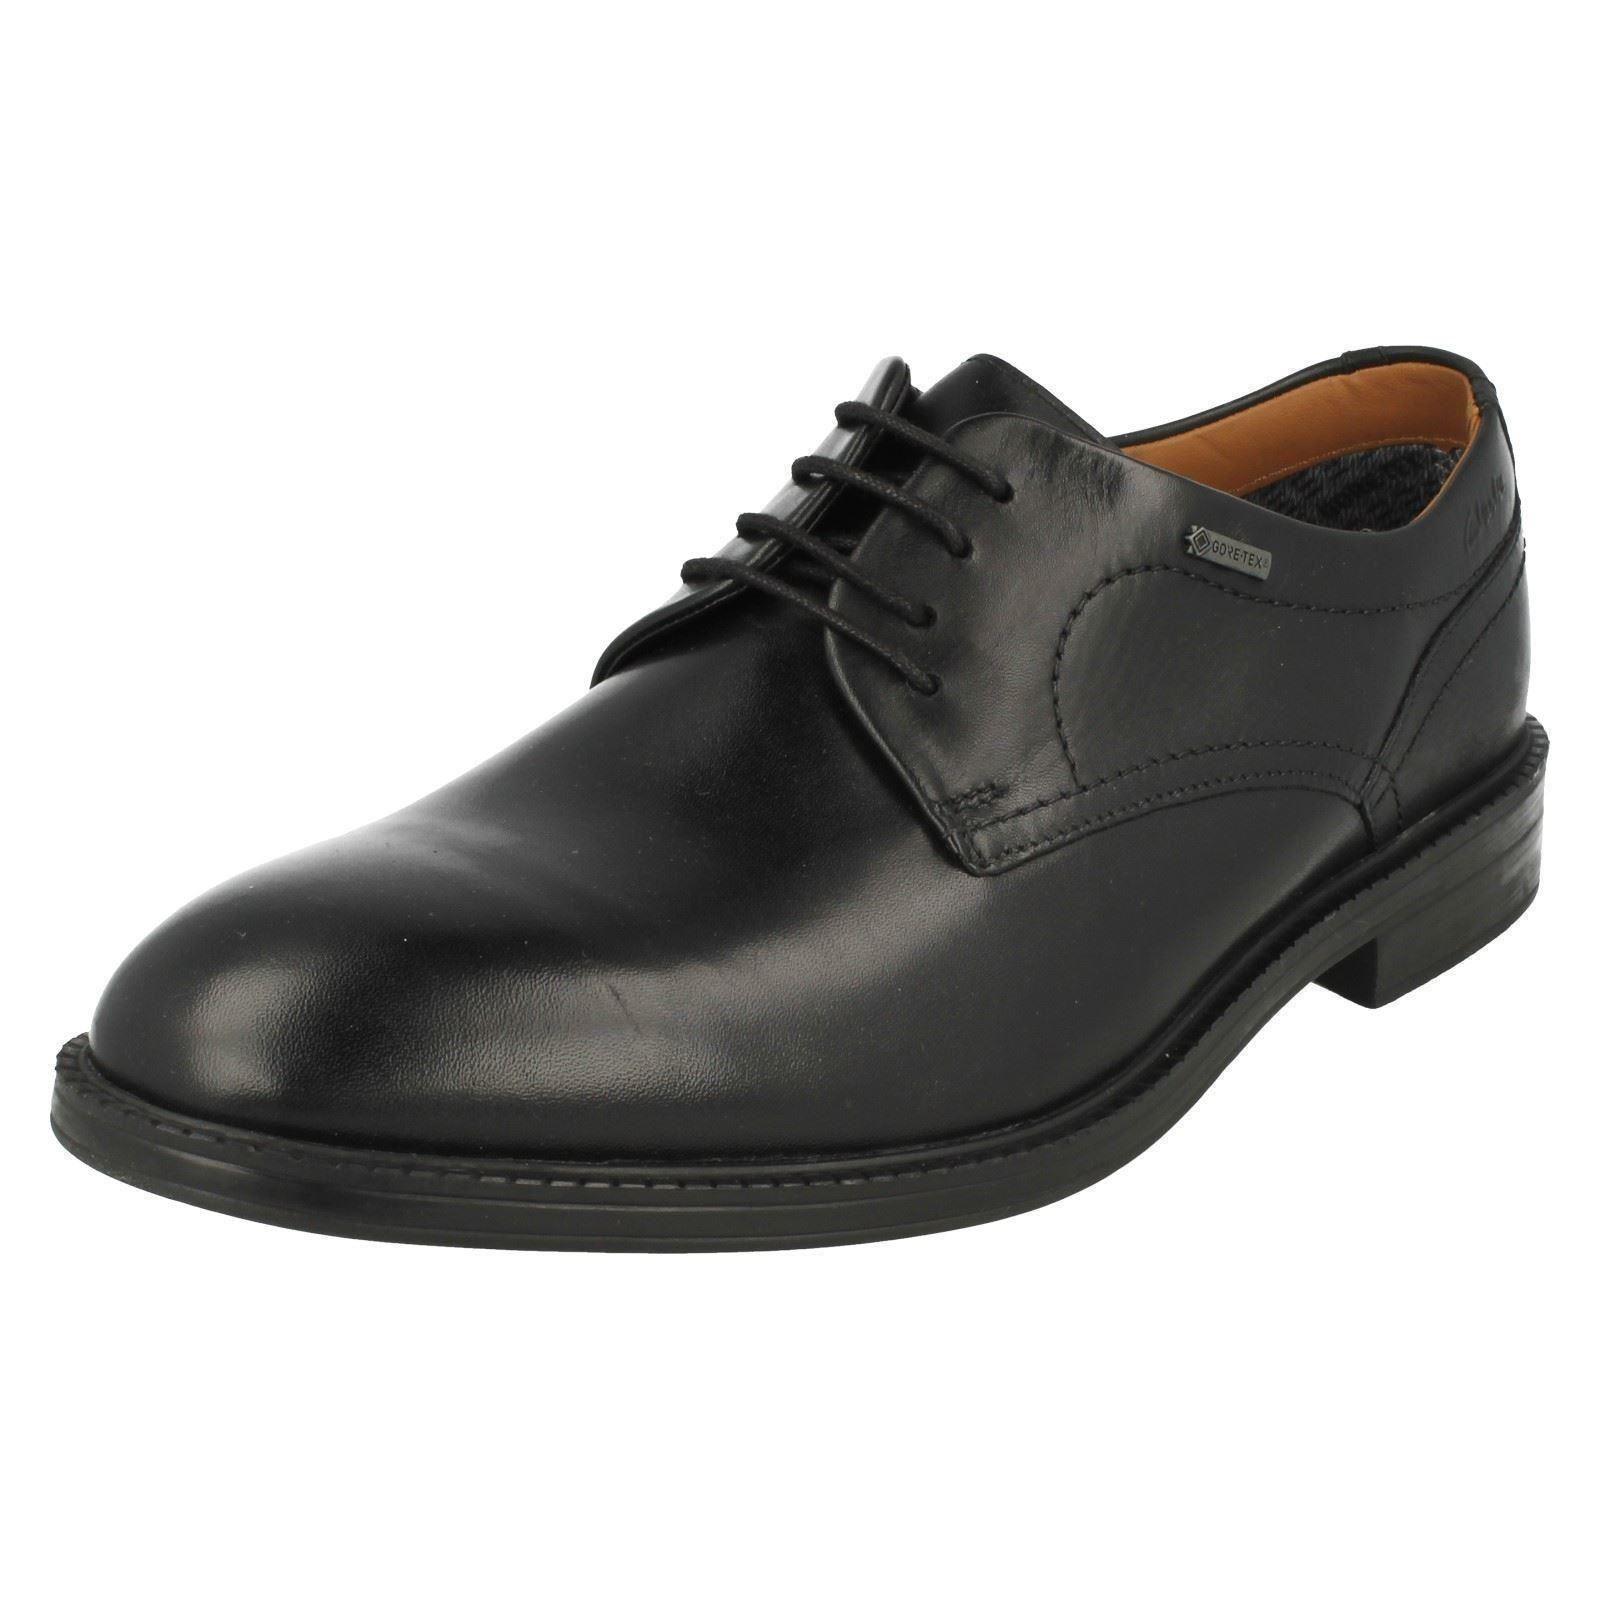 Mens Clarks Black Goretex Shoes